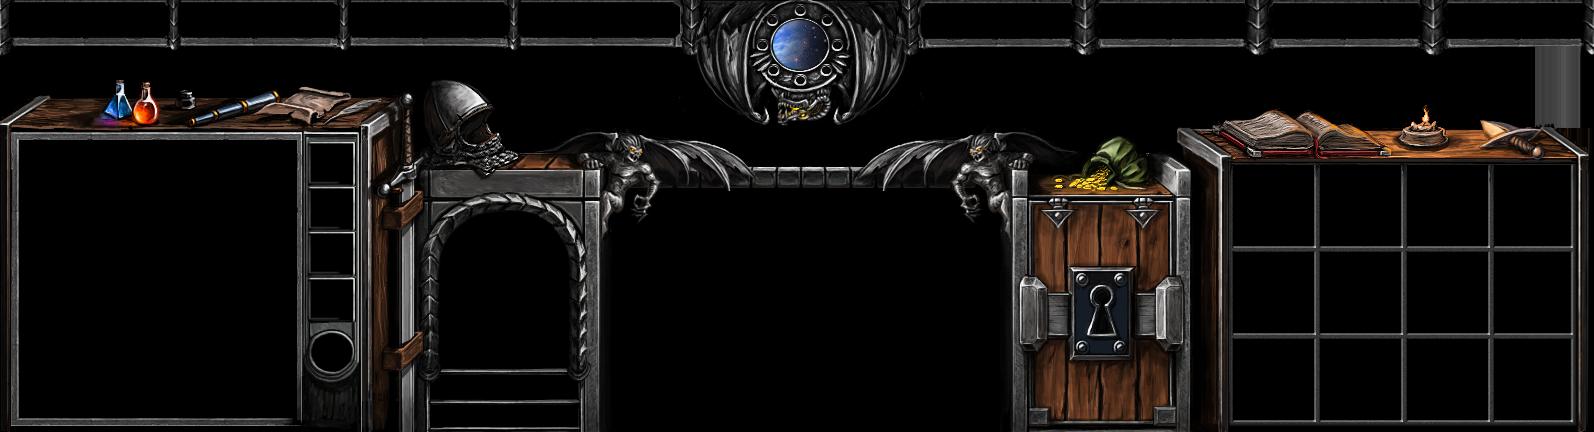 DungeonSpotlight1.png